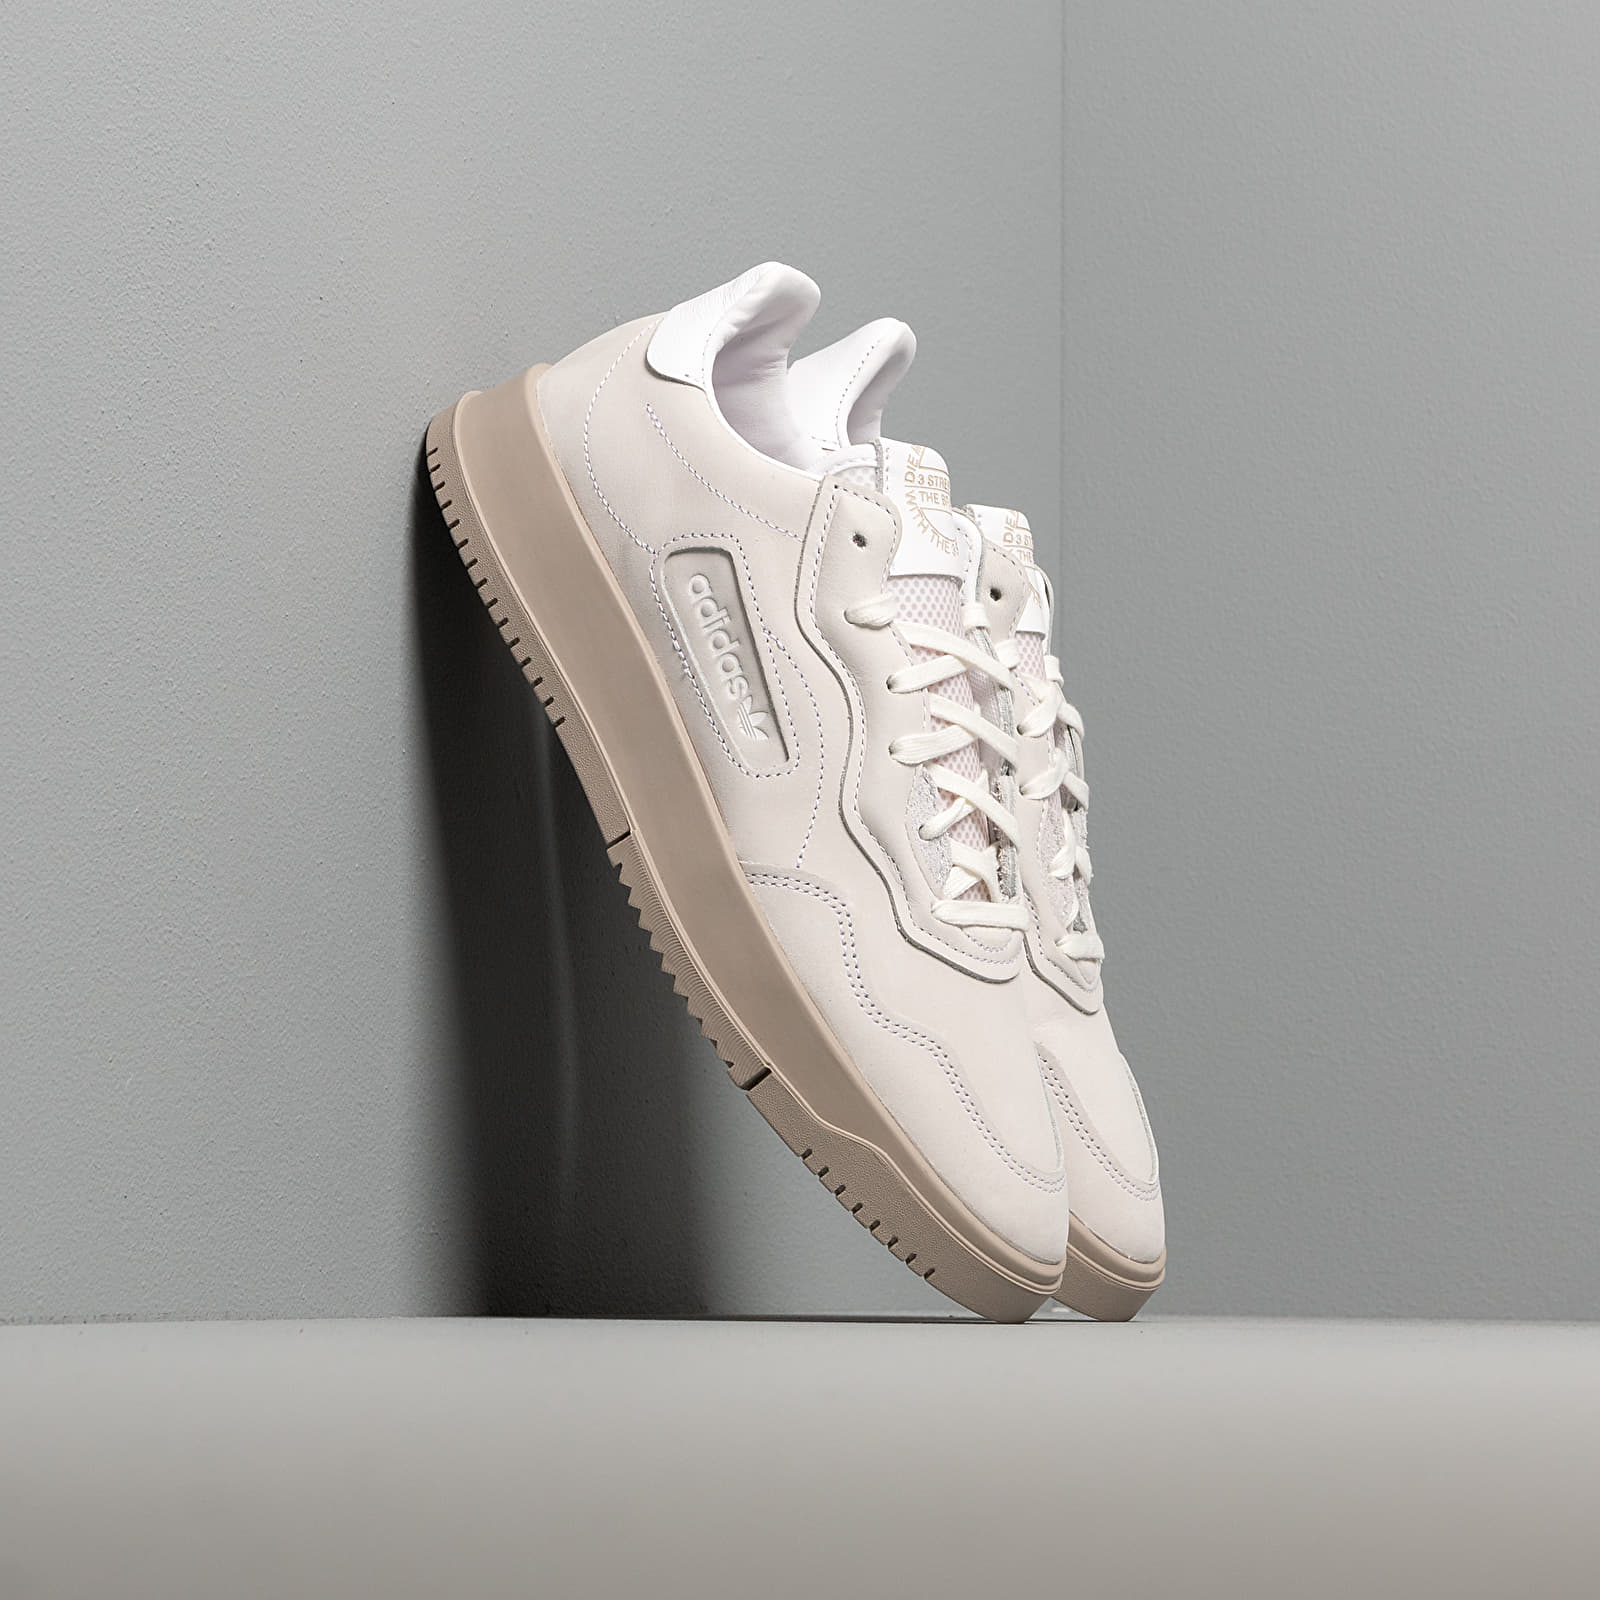 Chaussures et baskets femme adidas SC Premiere W Ftw White/ Ftw White/ Light Brown